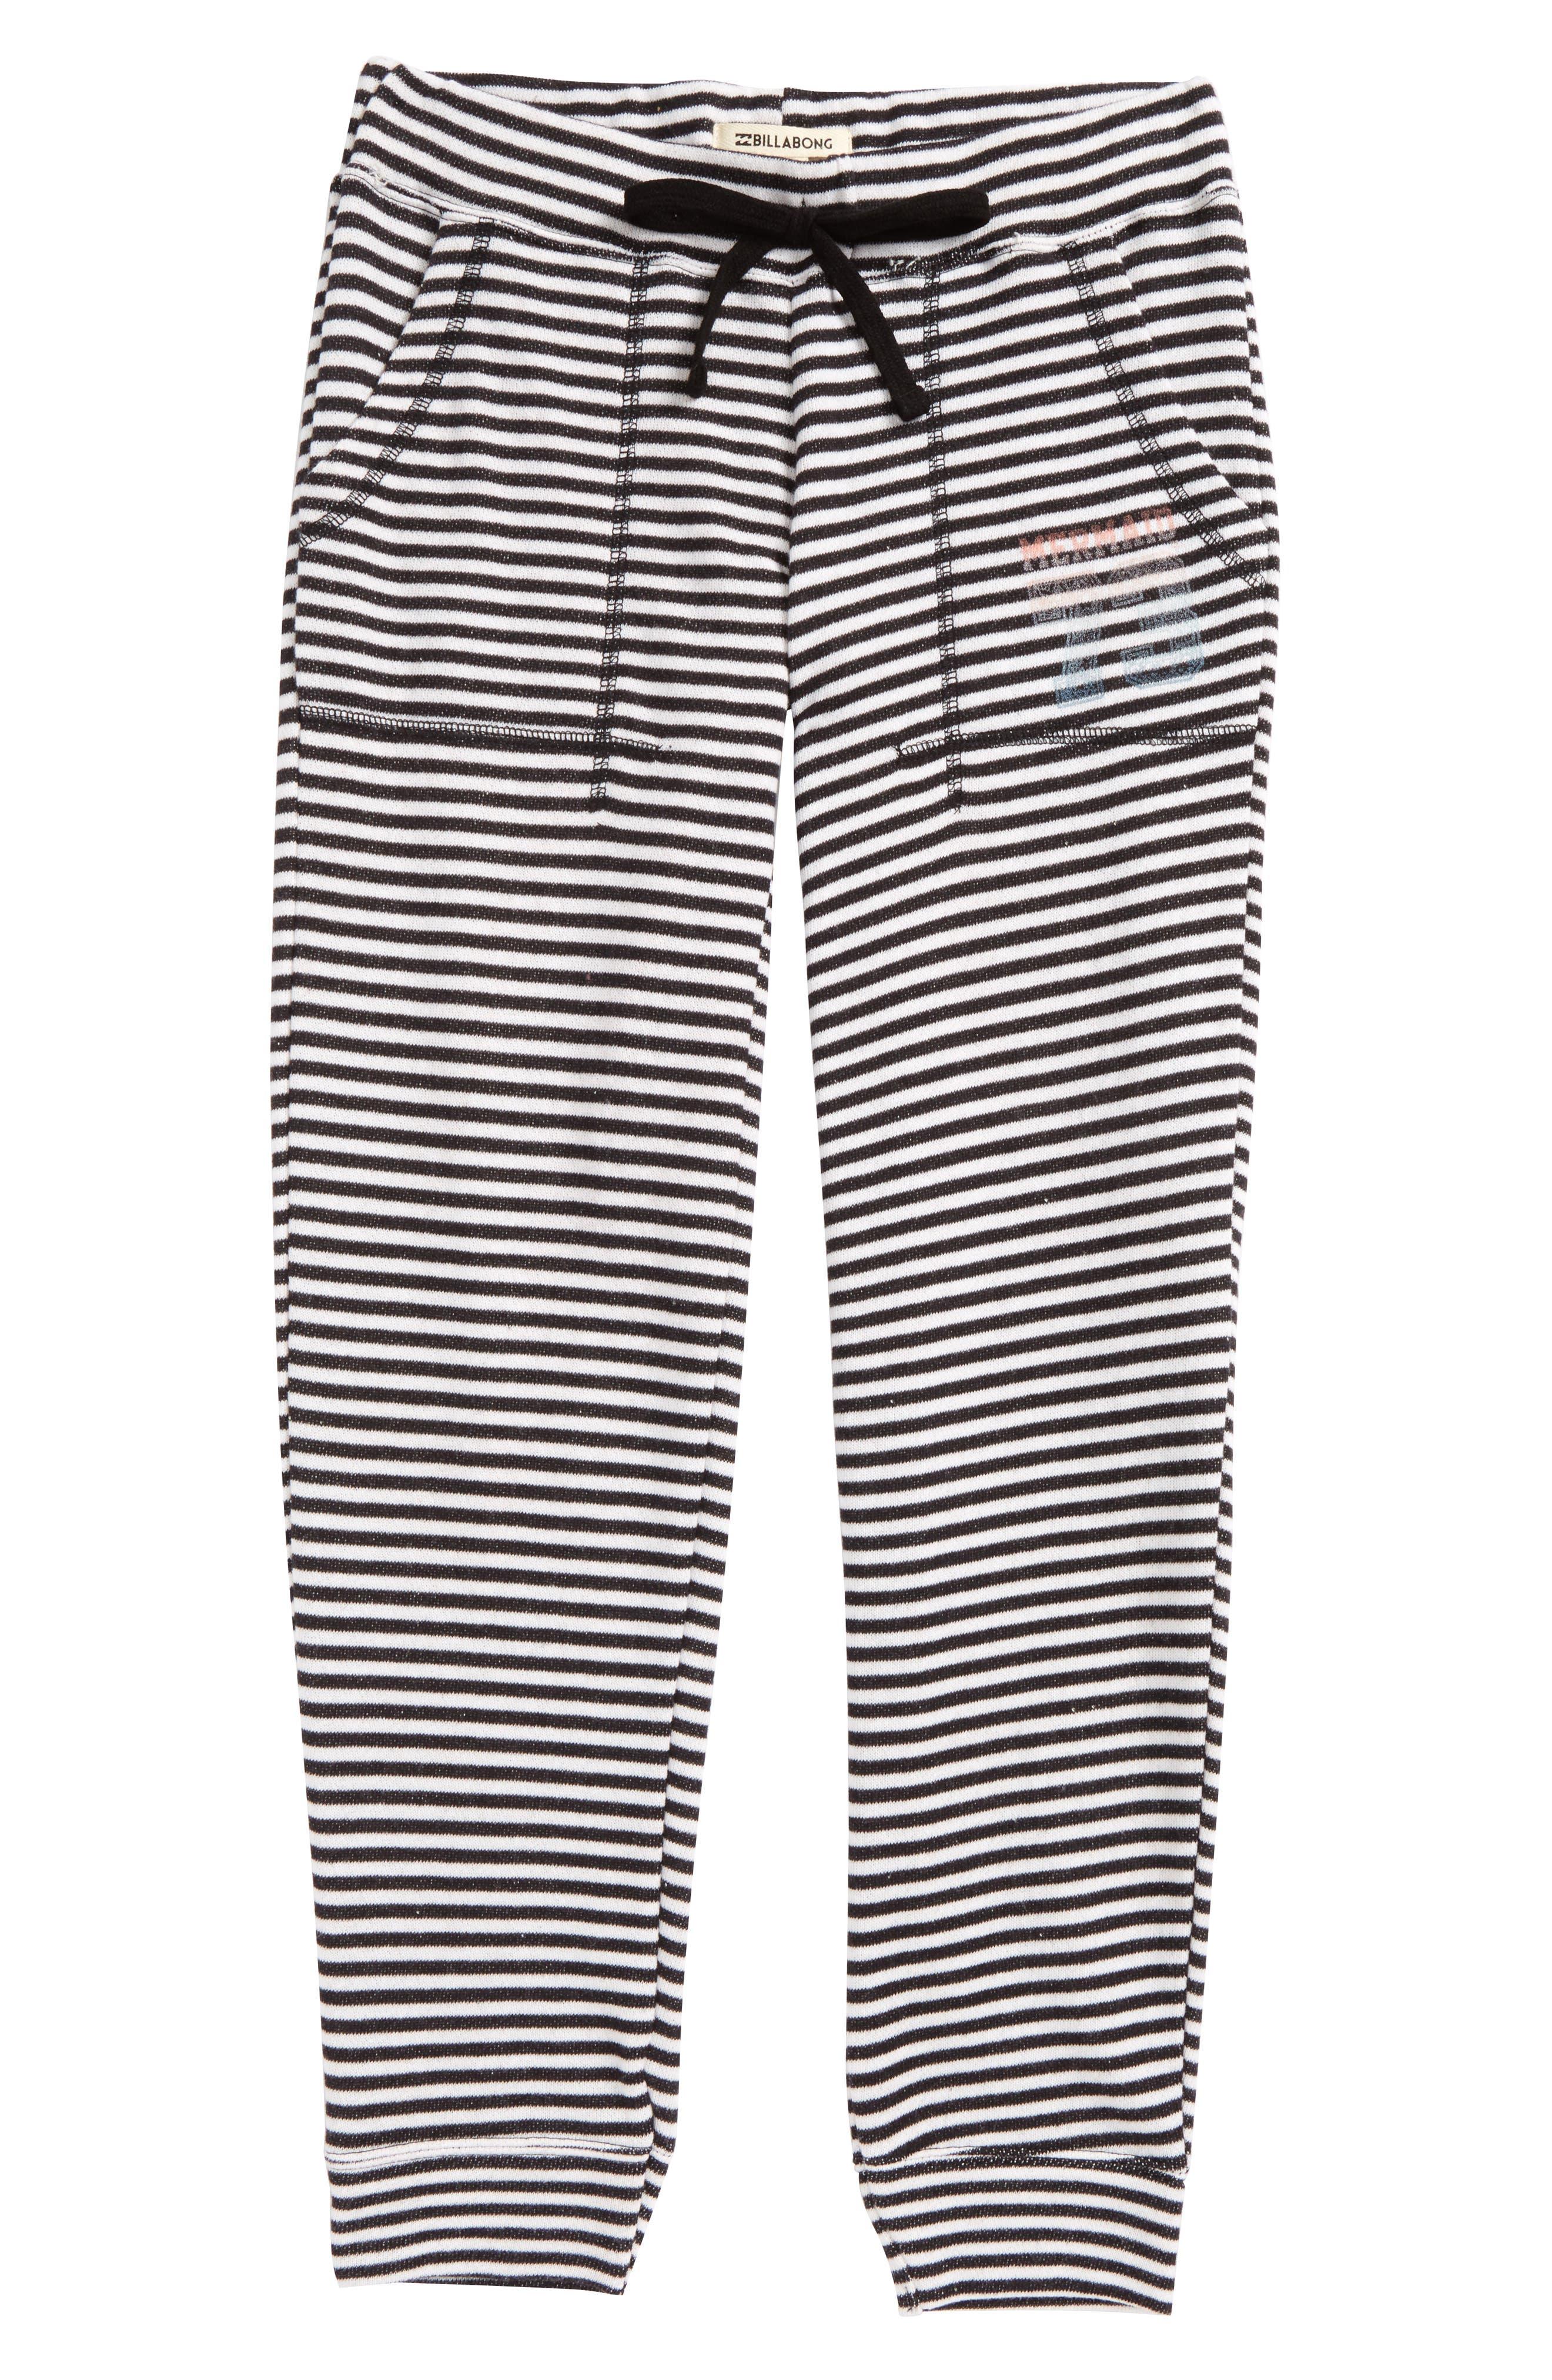 Main Image - Billabong Safe Love Knit Pants (Little Girls & Big Girls)